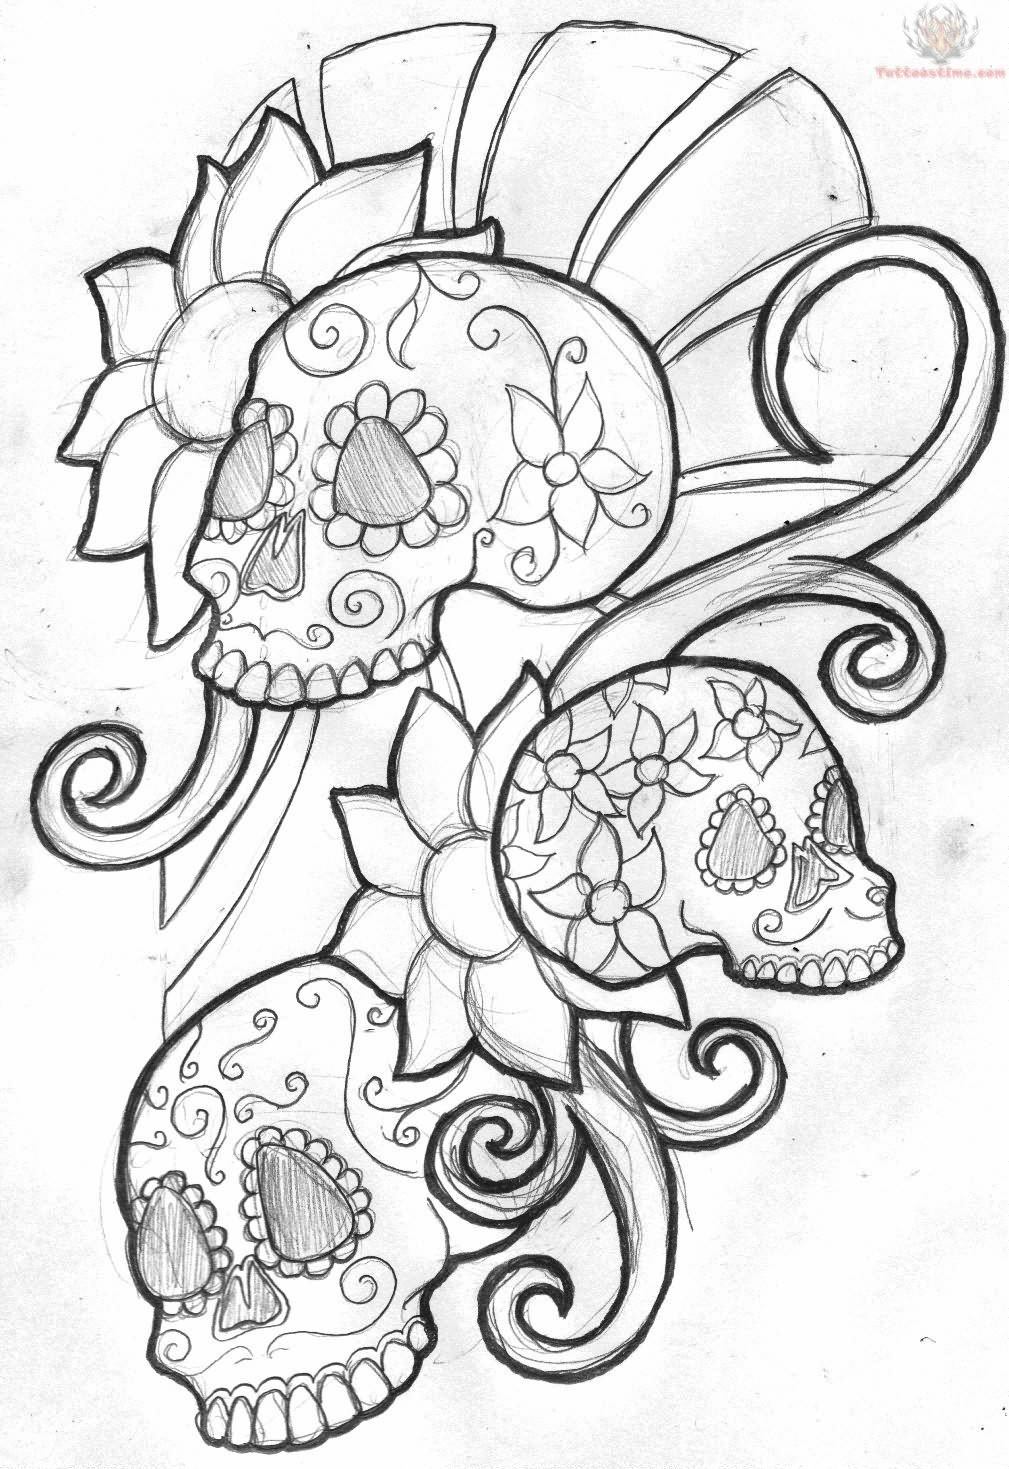 1009x1469 Cool Zombie Skull Tattoo Drawings Drawings Tagged